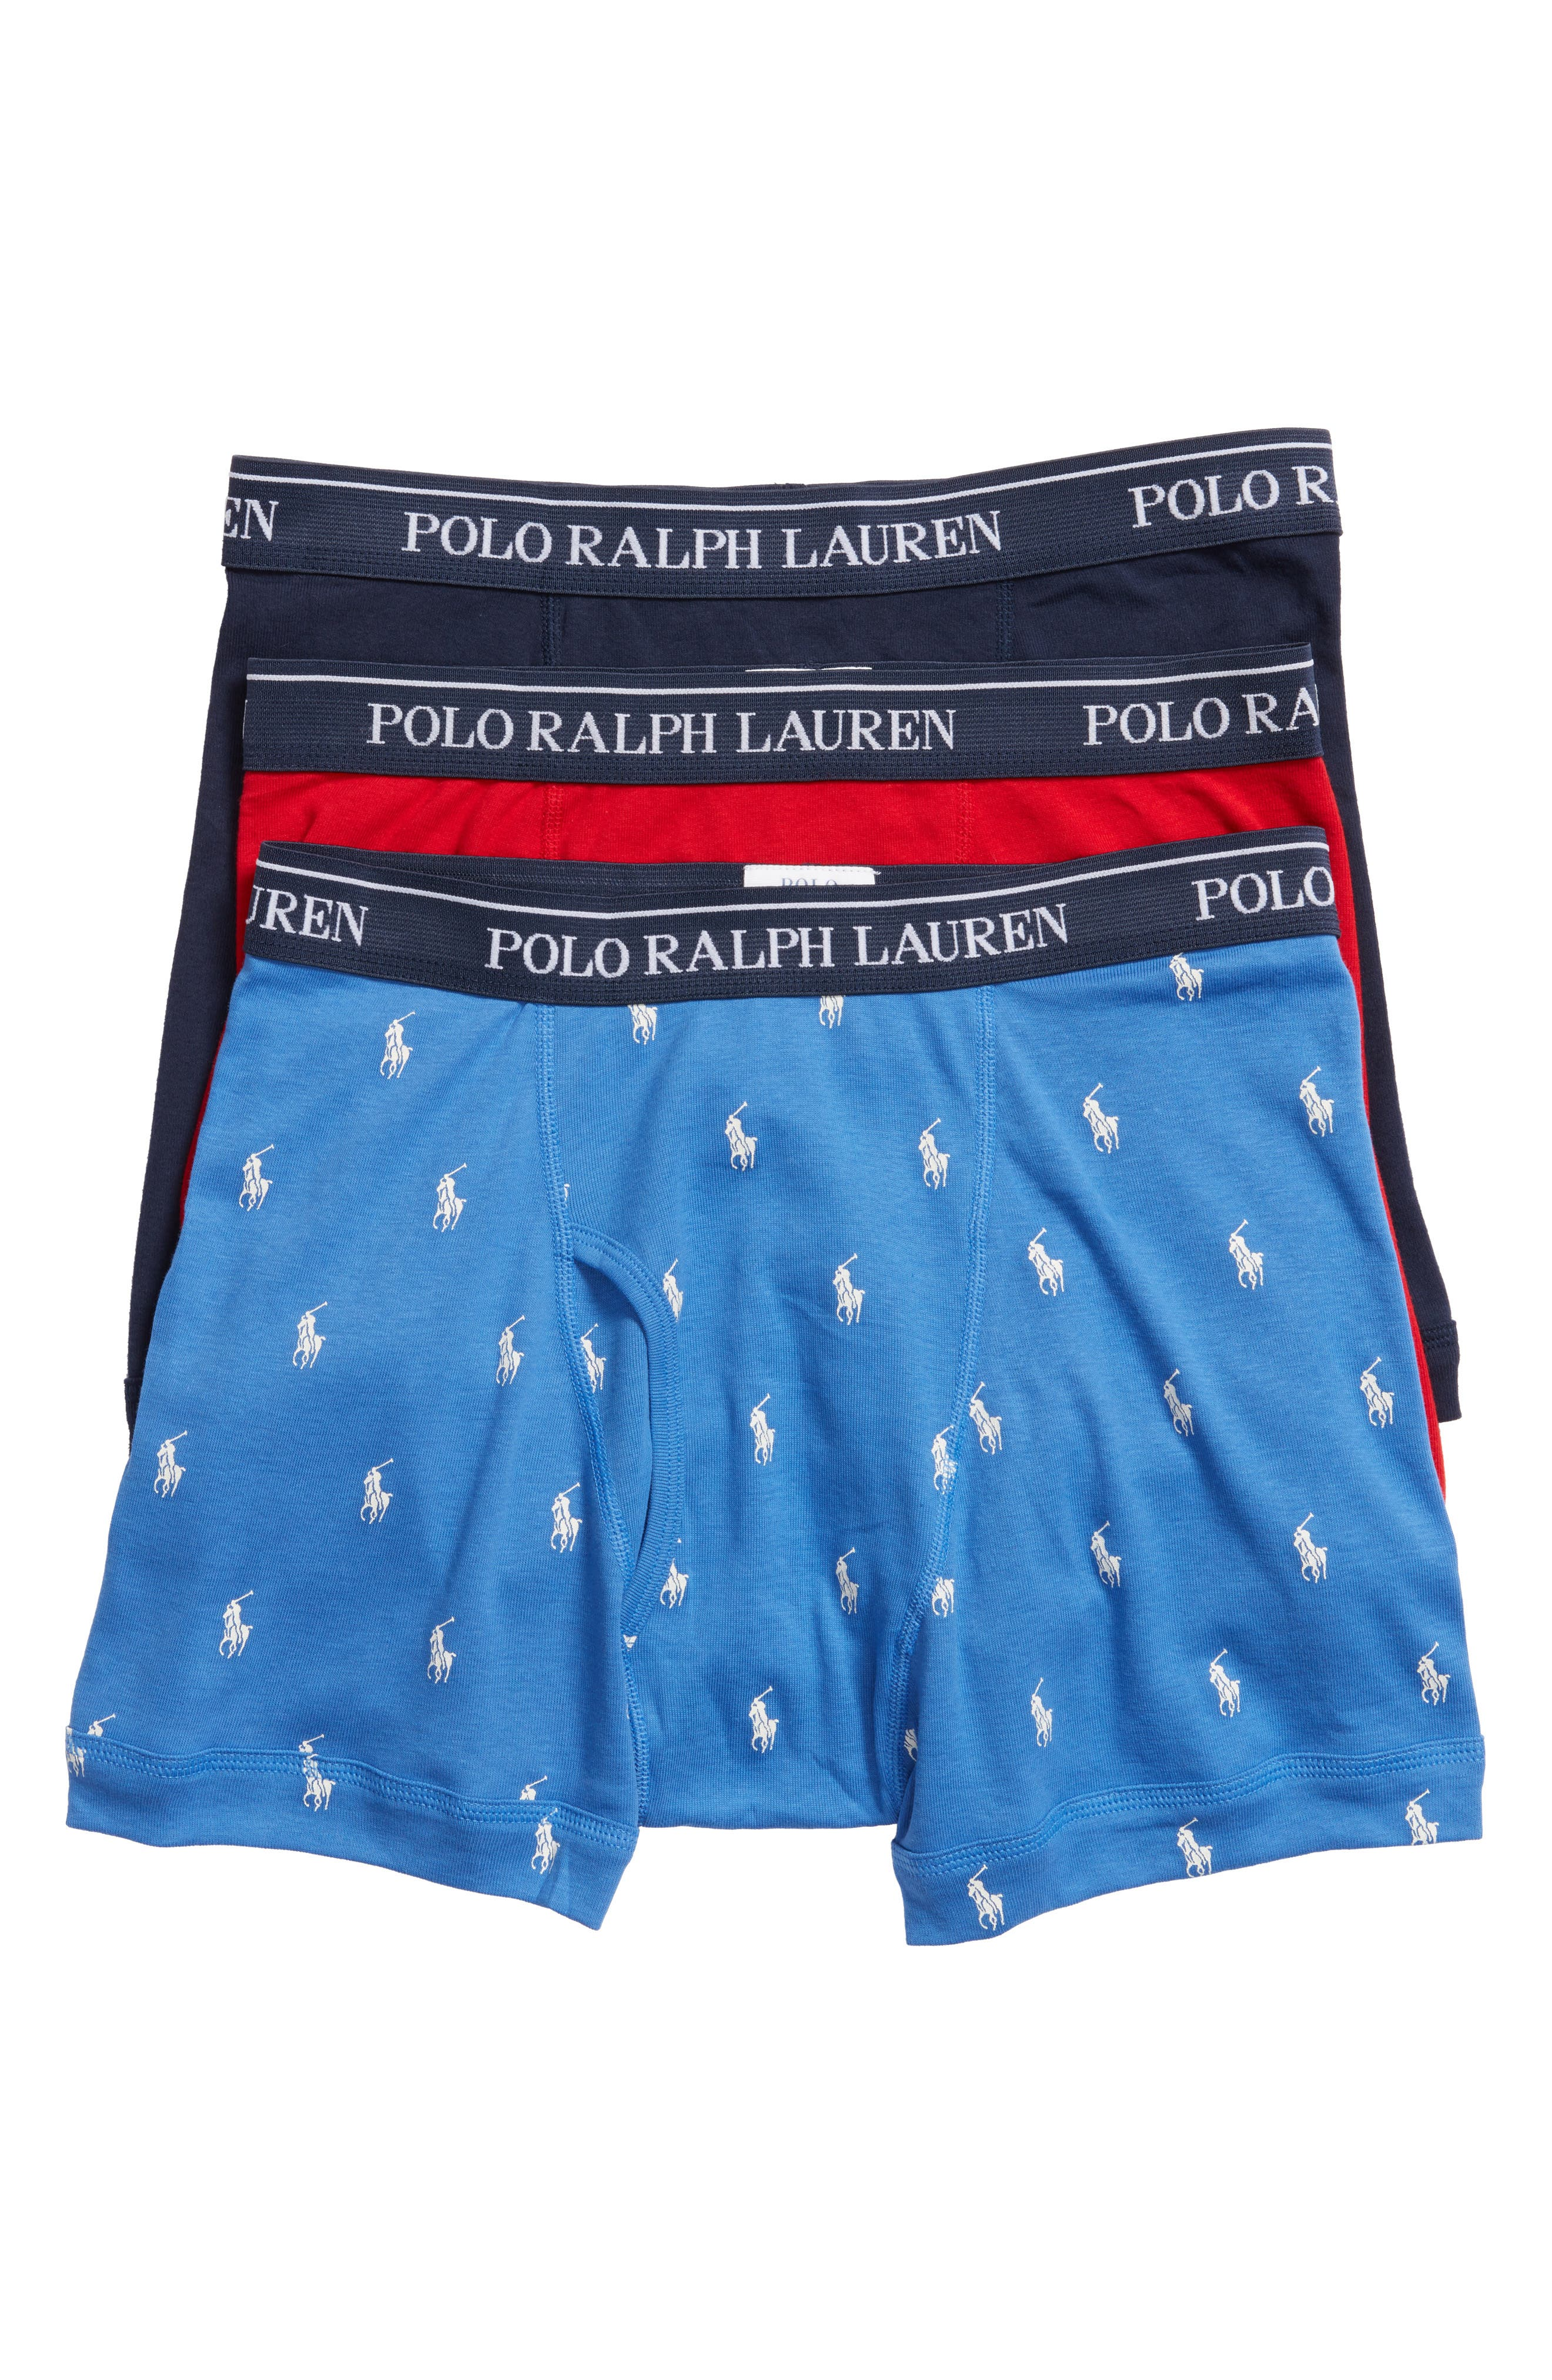 POLO RALPH LAUREN Assorted 3-Pack Cotton Boxer Briefs